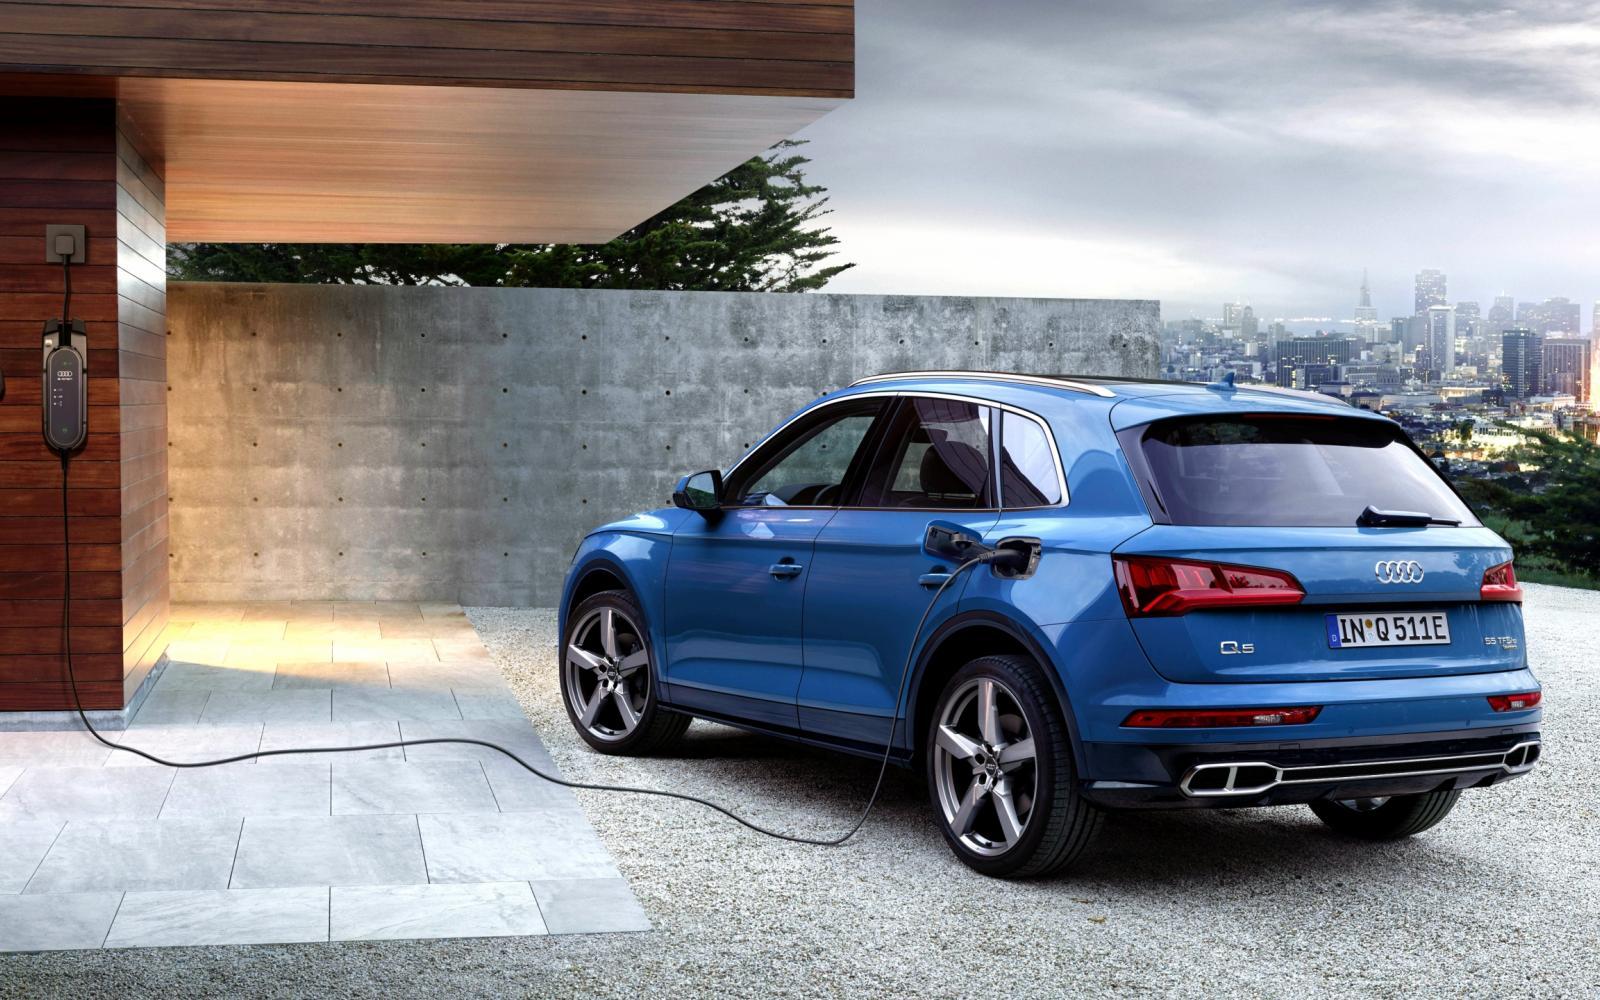 Audi Q5 krijgt stekker en heet voluit  'Audi Q5 55 TFSI e quattro'